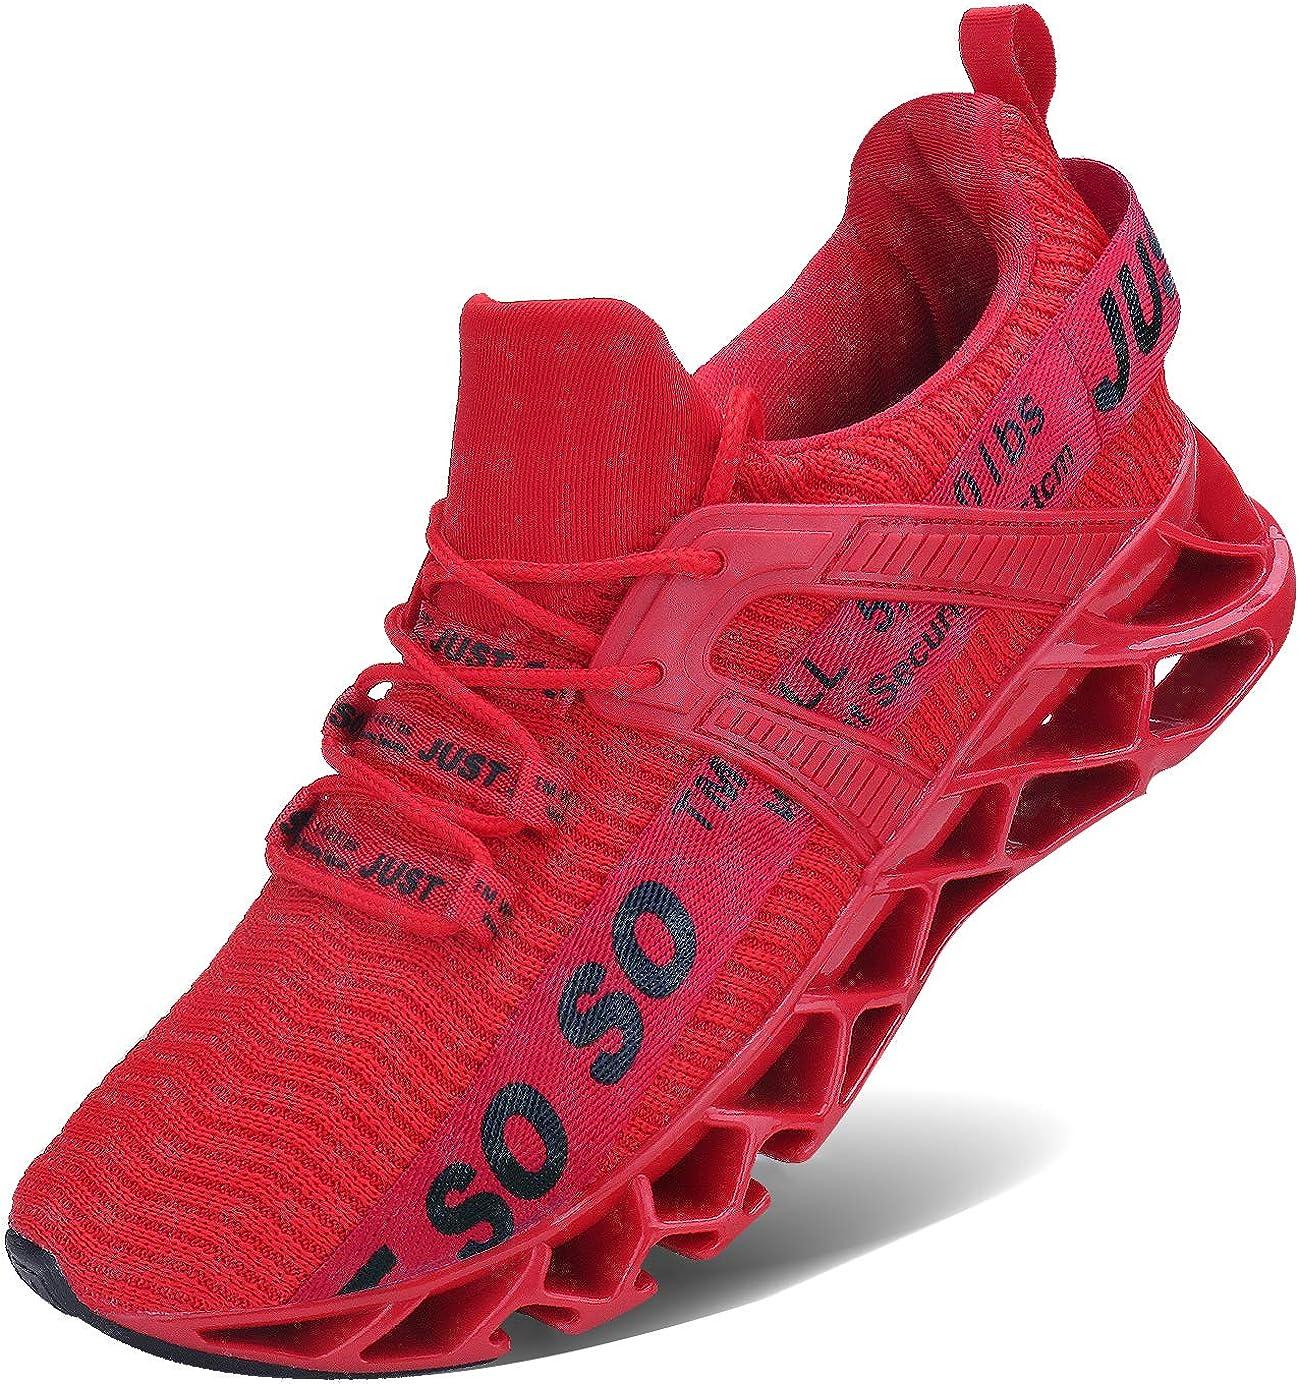 | Wonesion Womens Walking Running Shoes Athletic Blade Non Slip Tennis Fashion Sneakers | Walking